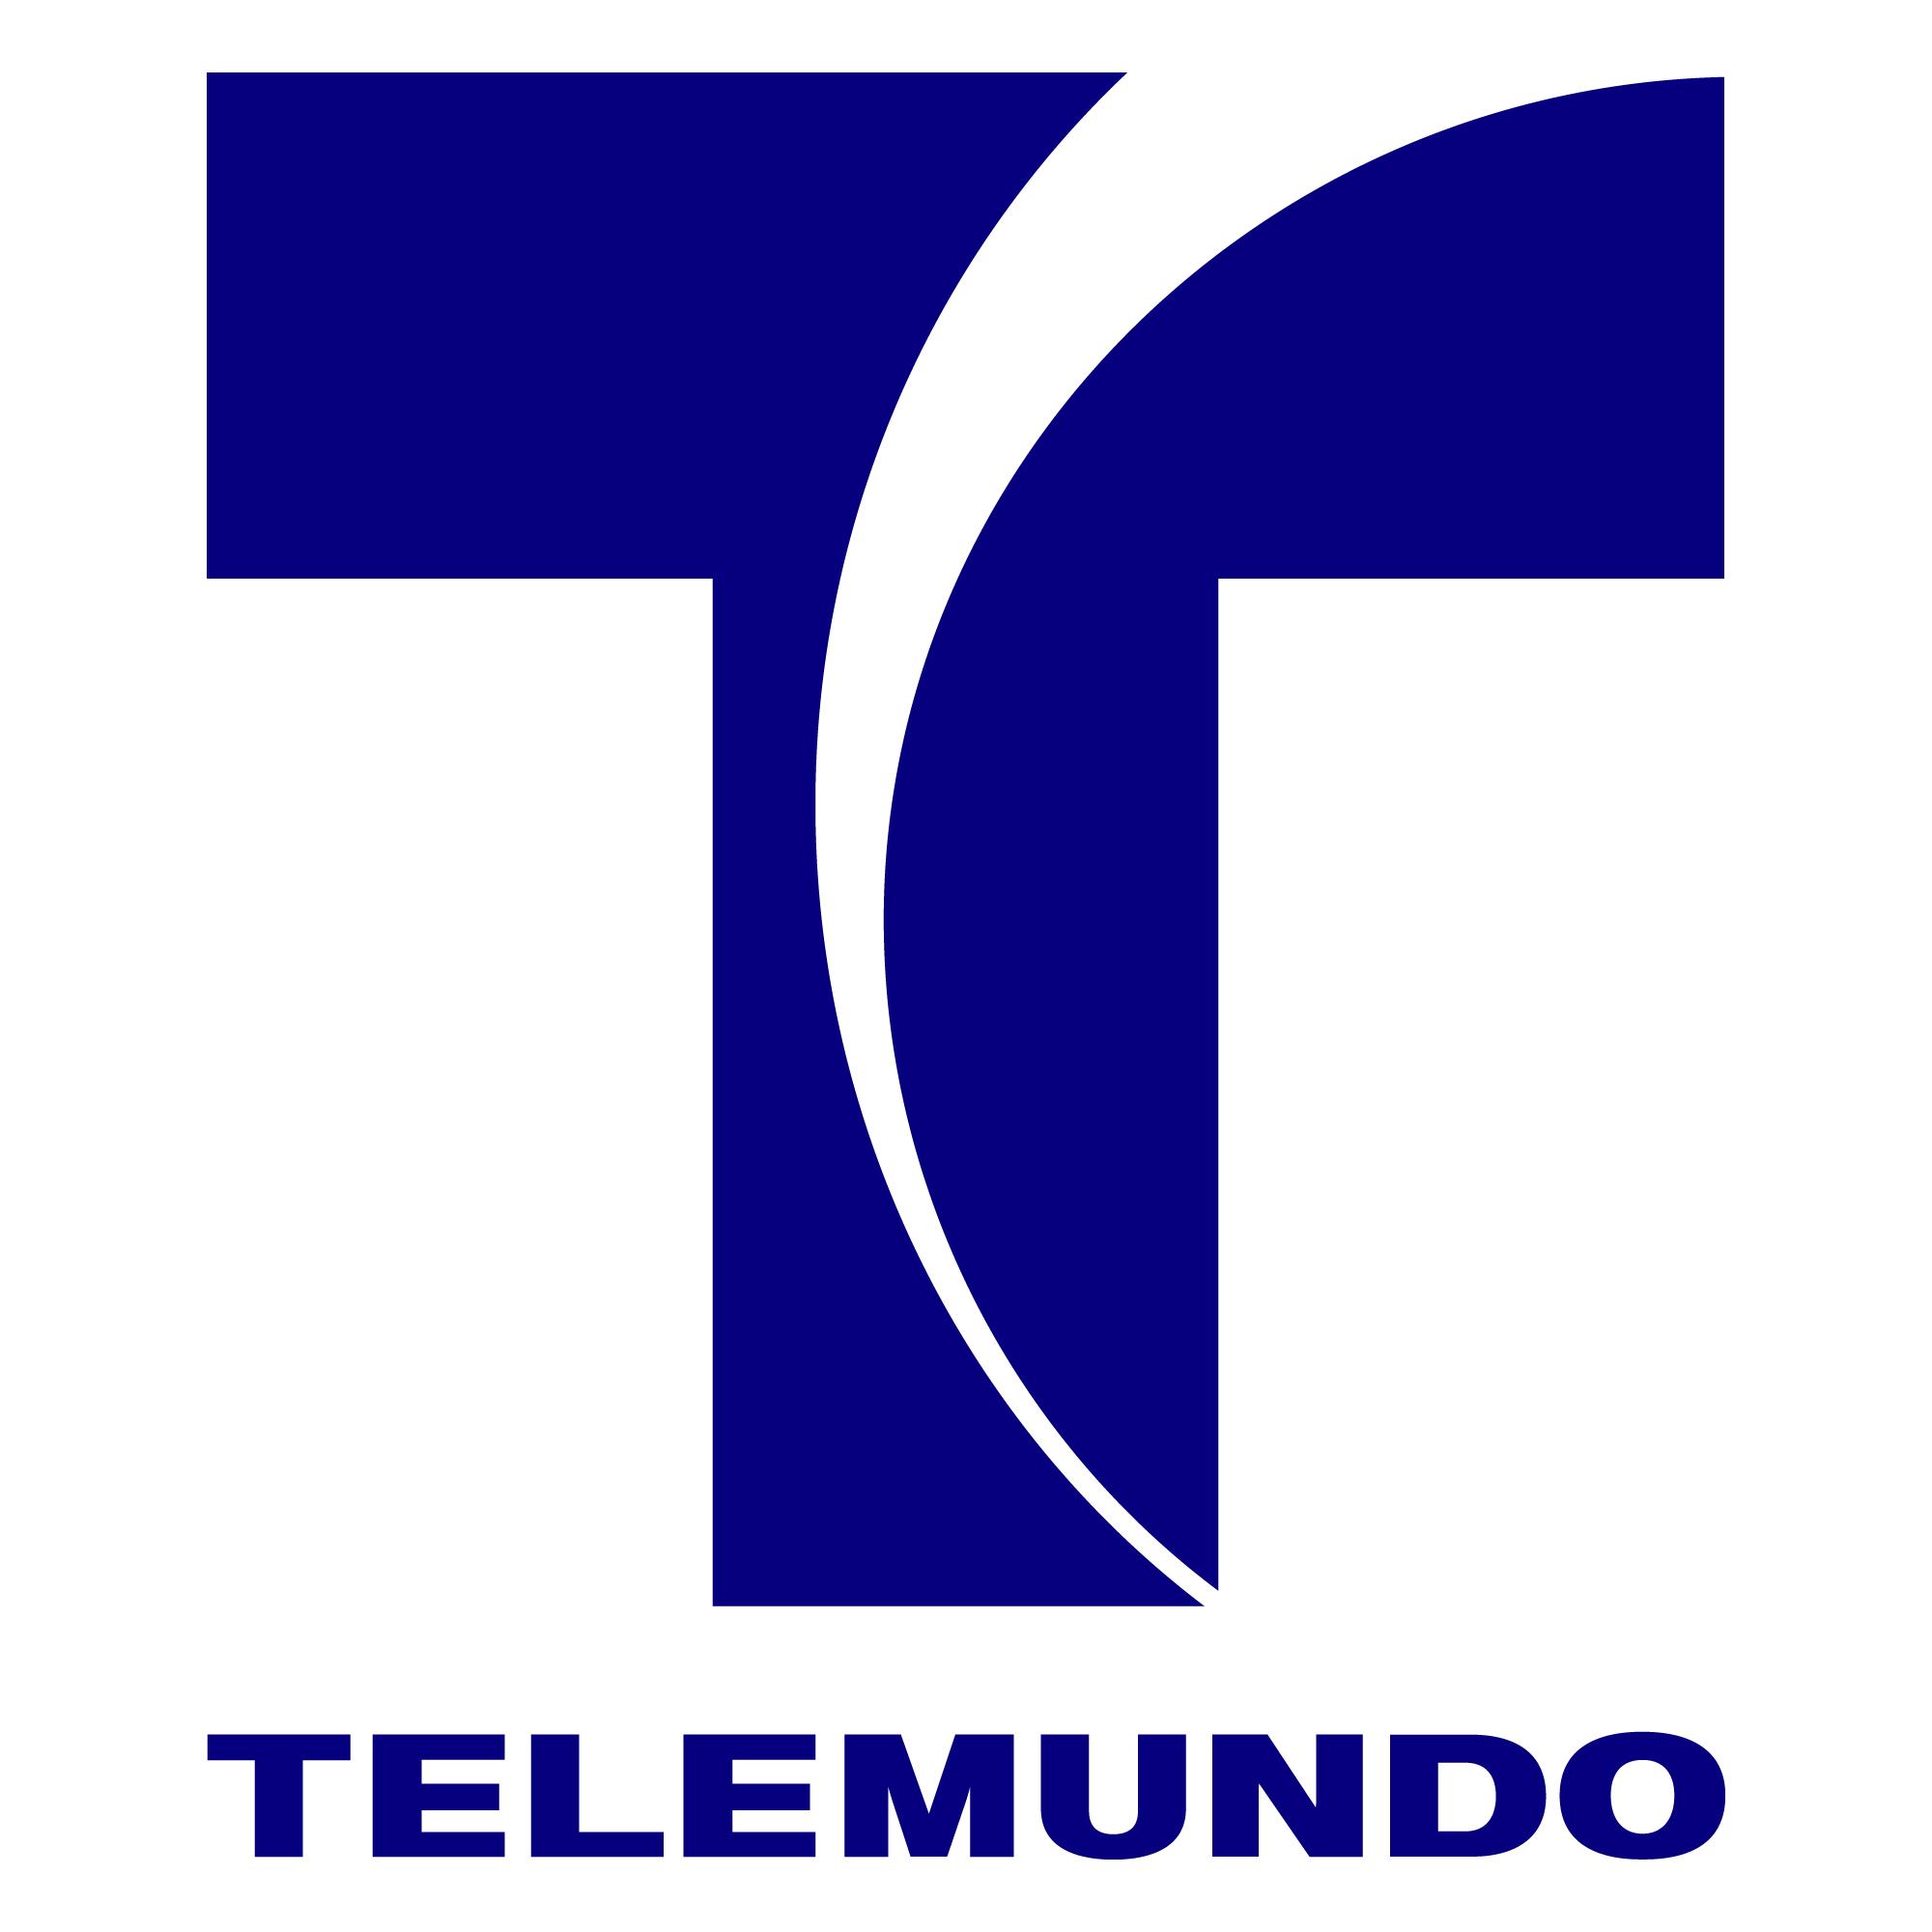 Telemundo.jpg